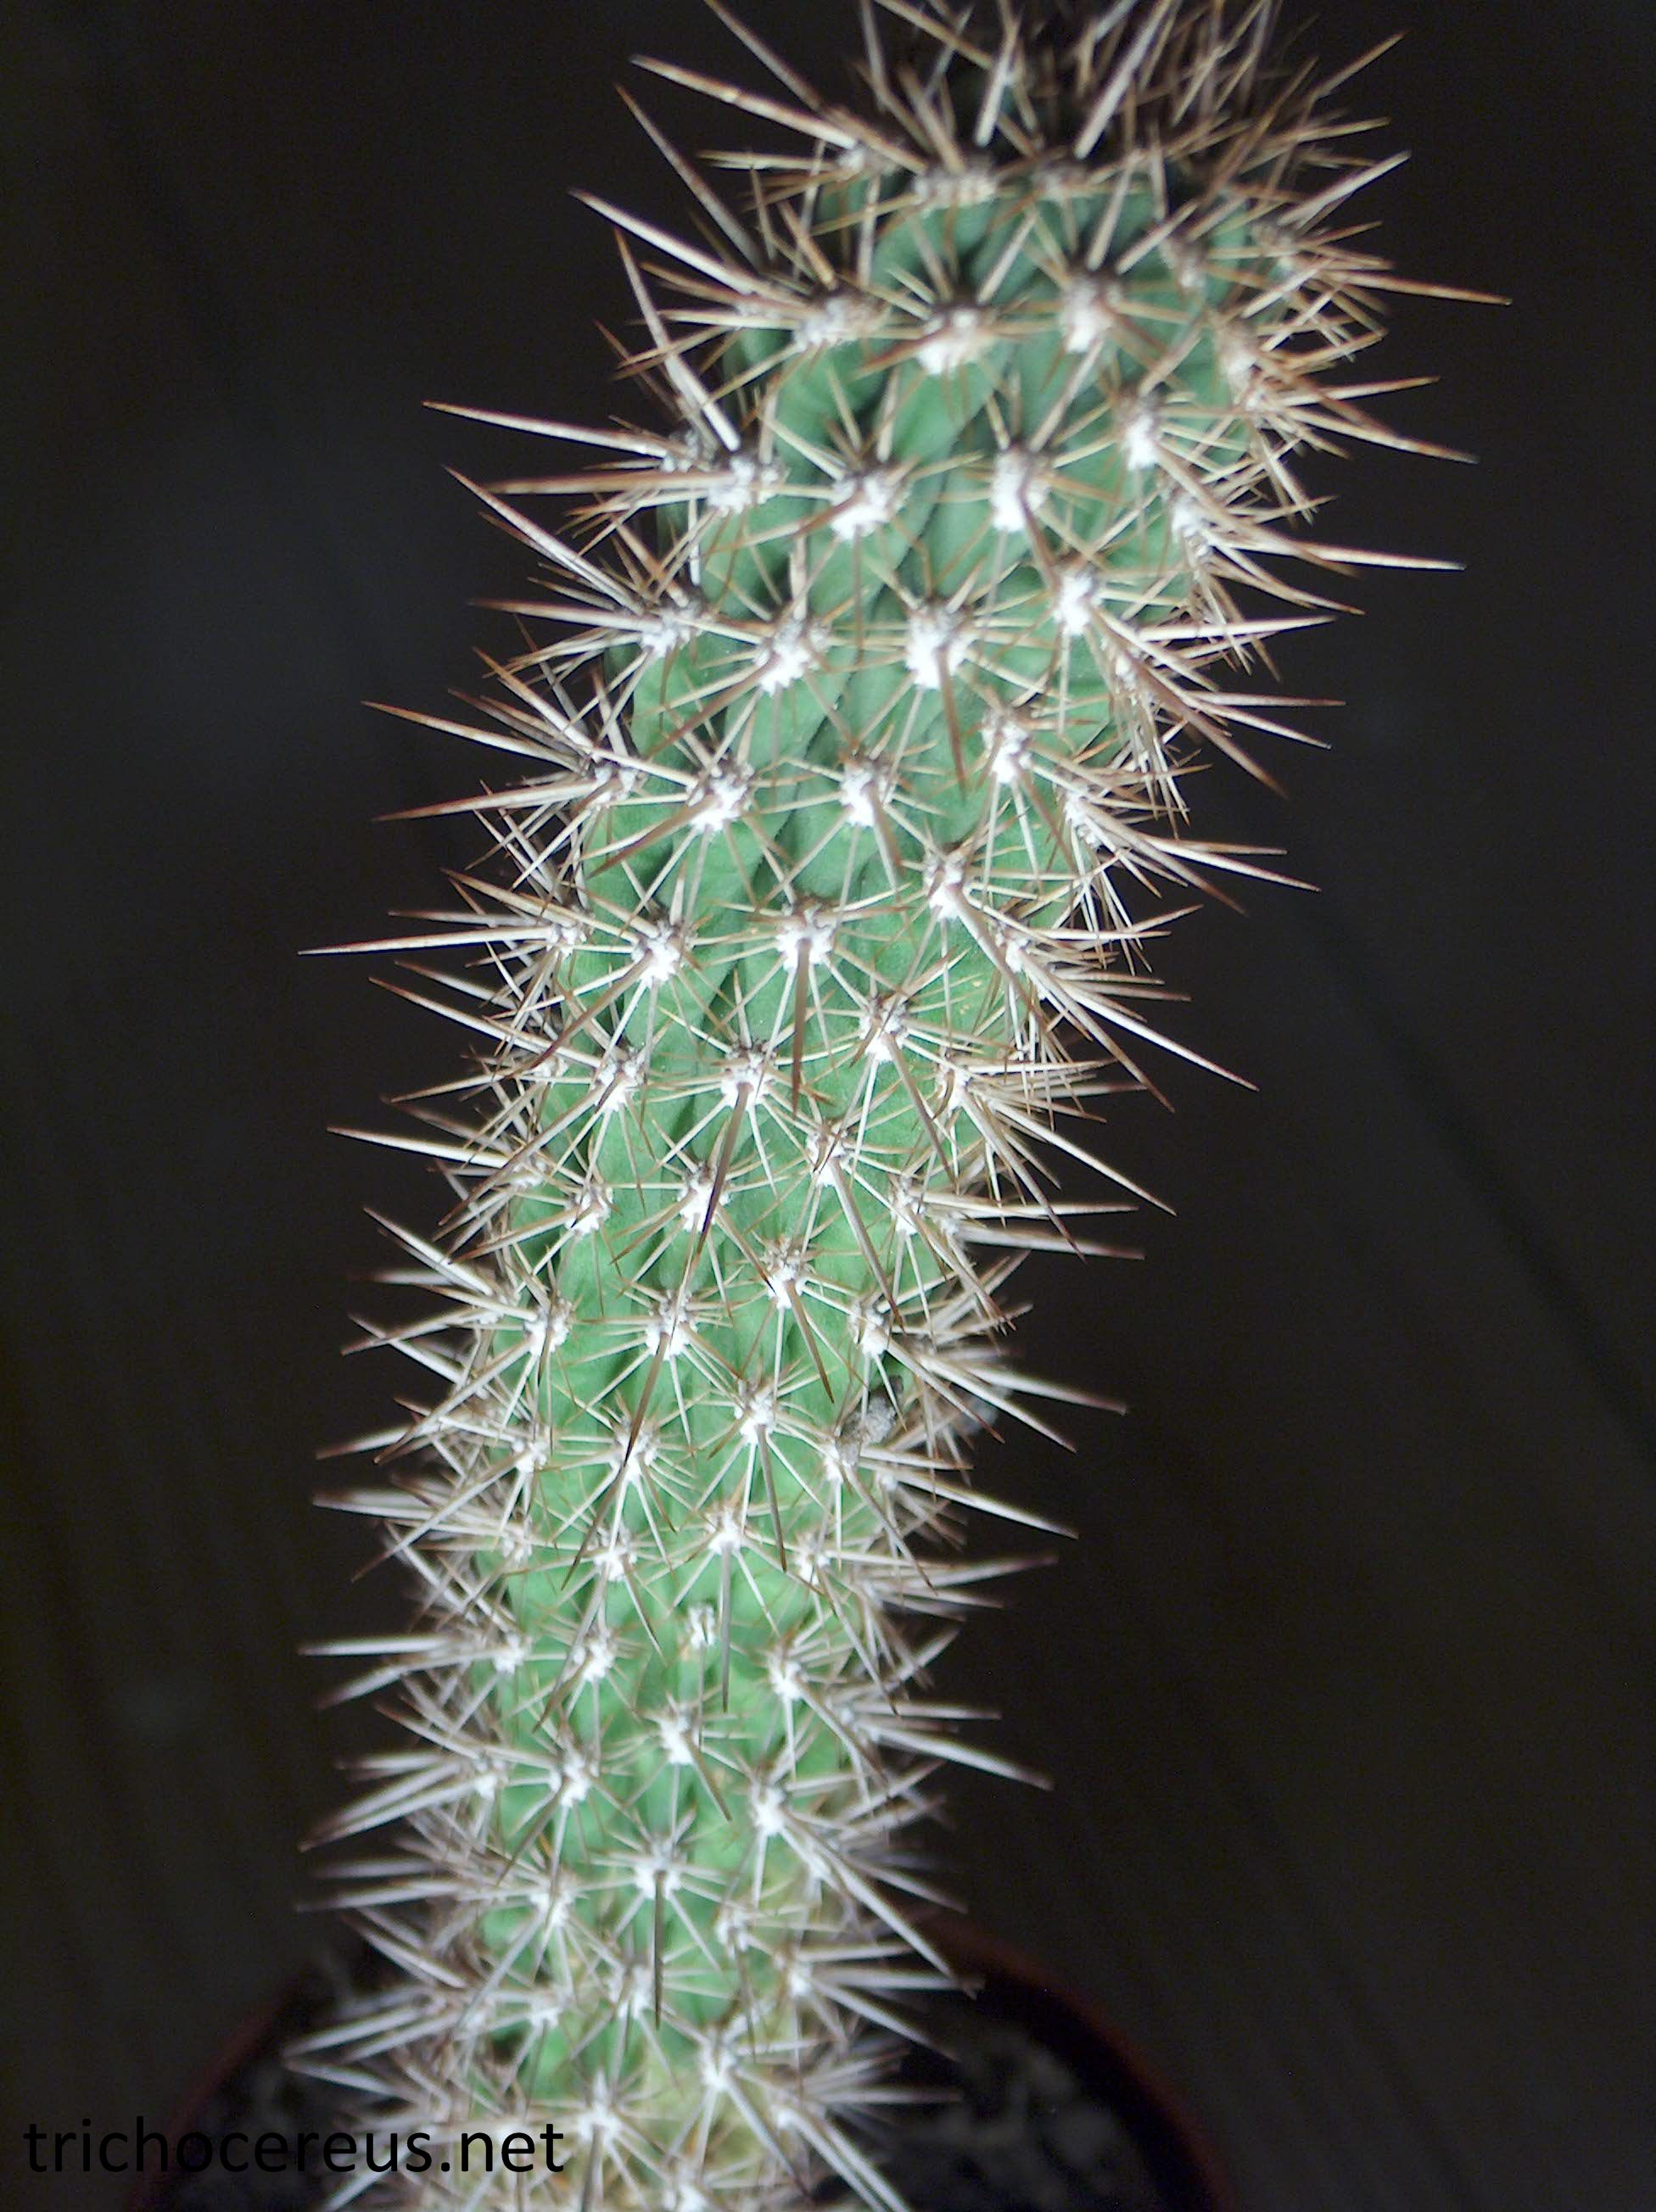 Trichocereus litoralis Echinopsis chiloensis ssp. litoralis 4